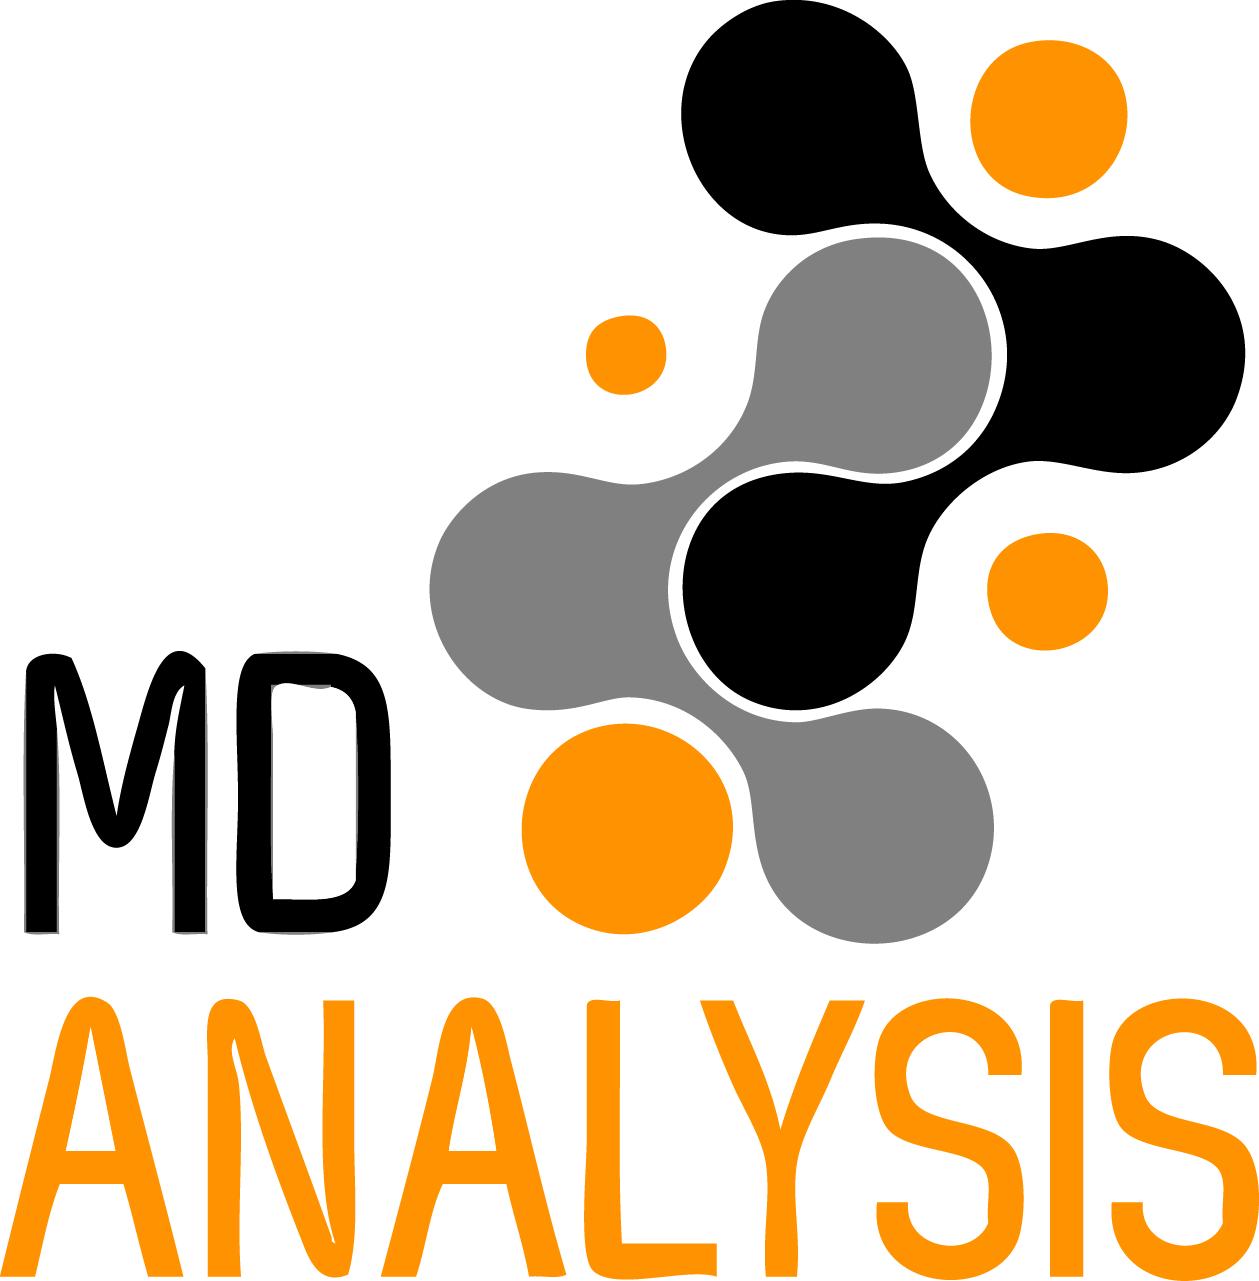 http://www.mdanalysis.org/public/mdanalysis-logo_square.png